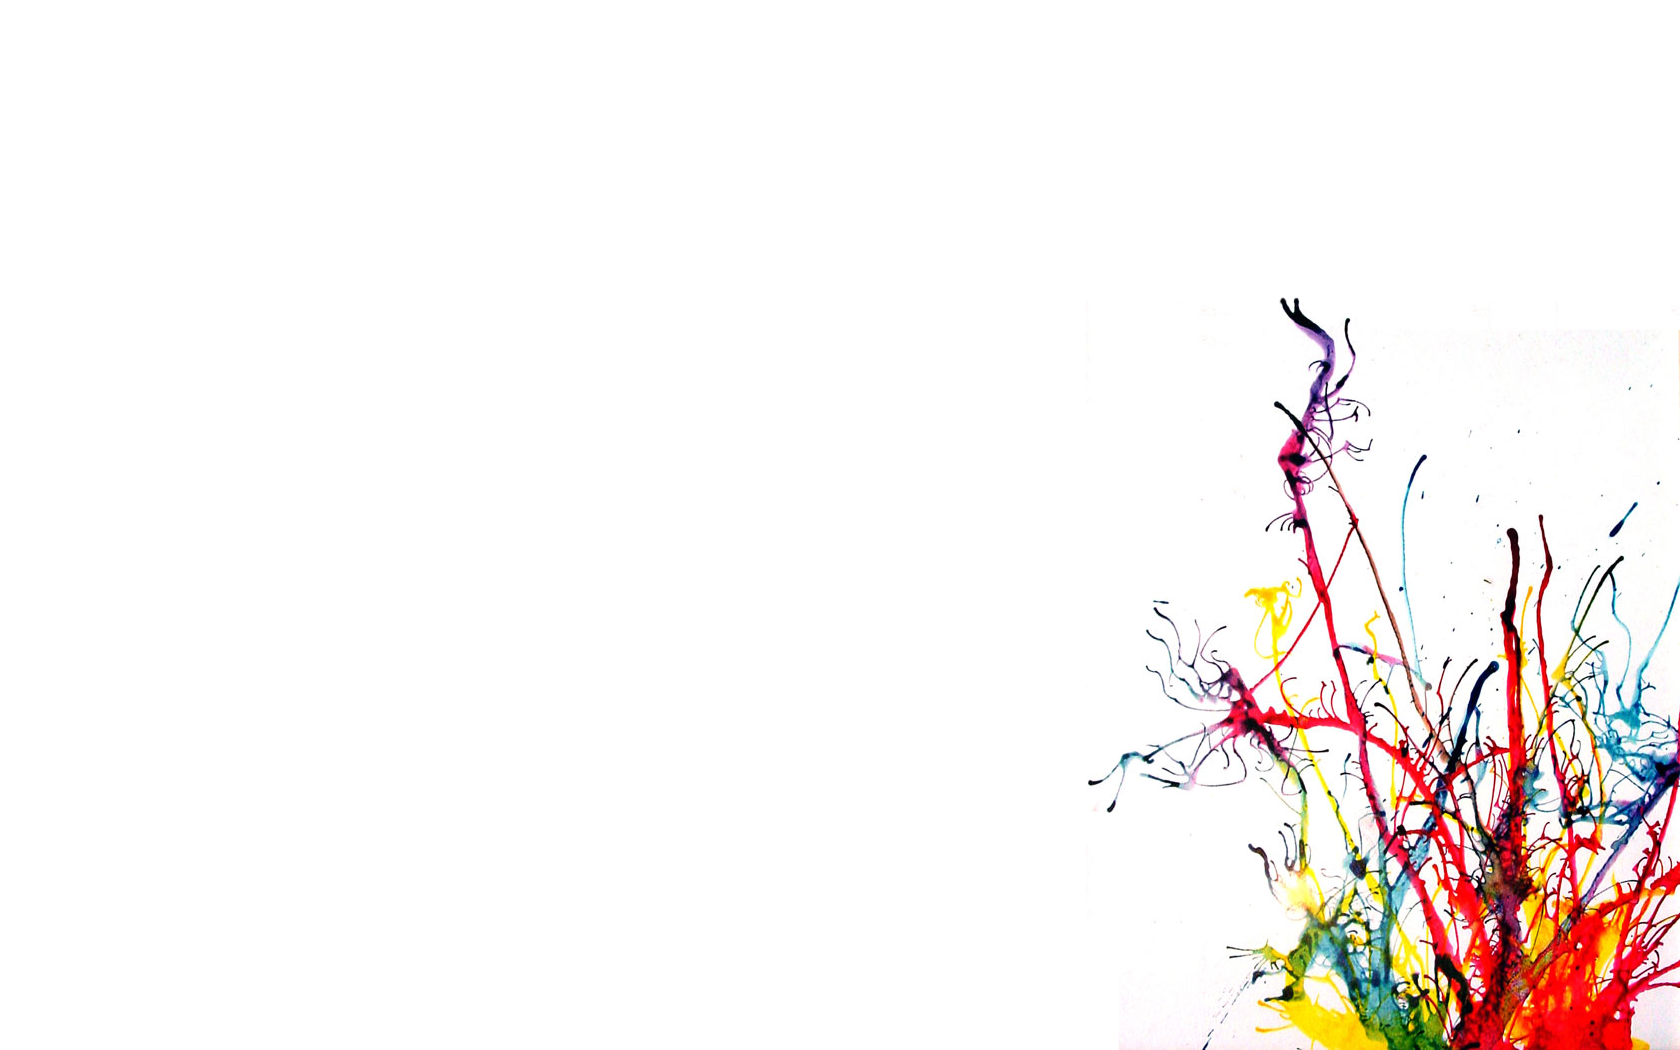 splash of color hd - photo #40